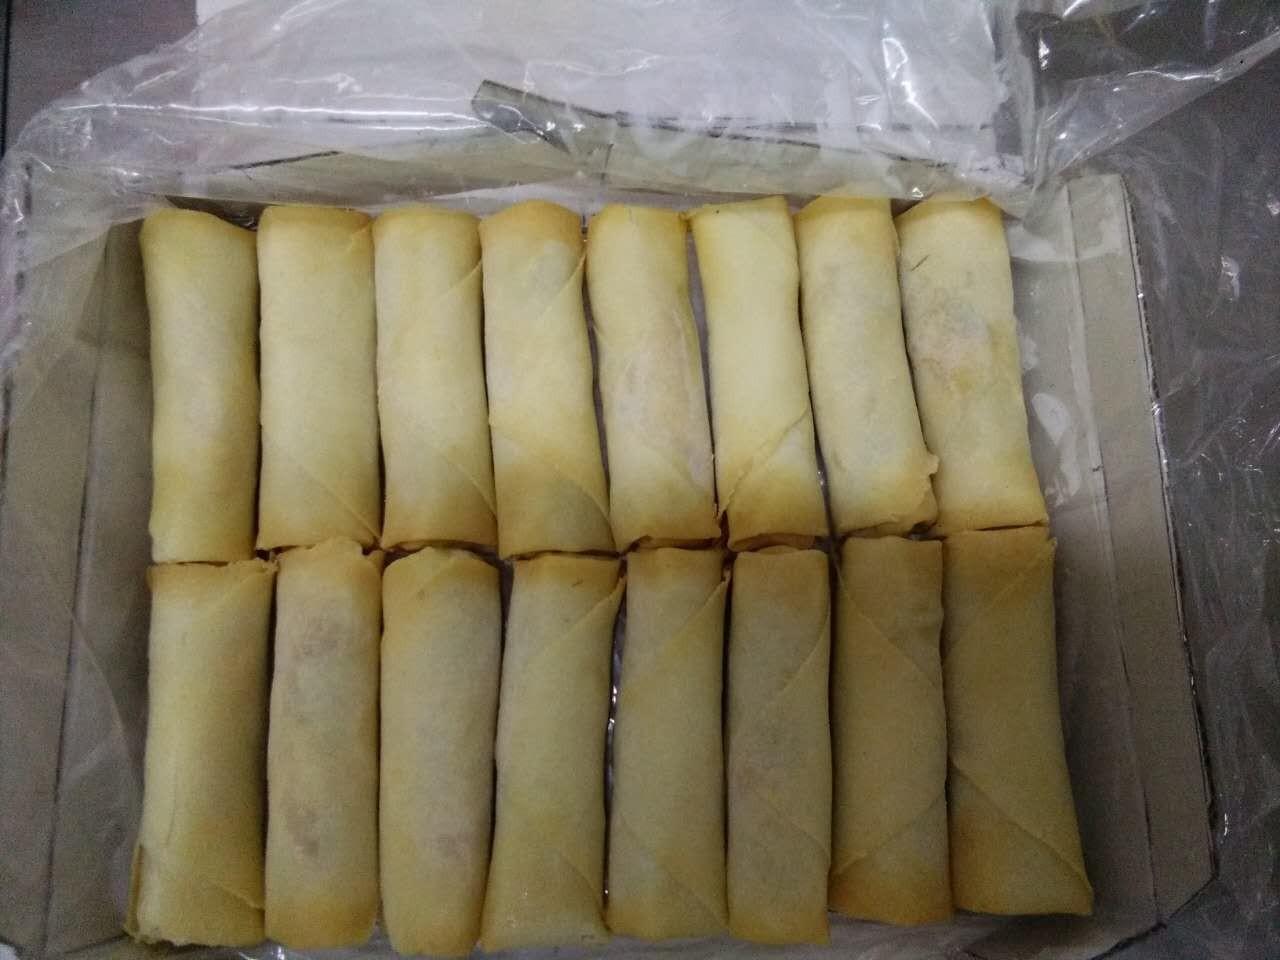 Frozen Spring Vegetable Roll Manufacturers, Frozen Spring Vegetable Roll Factory, Supply Frozen Spring Vegetable Roll